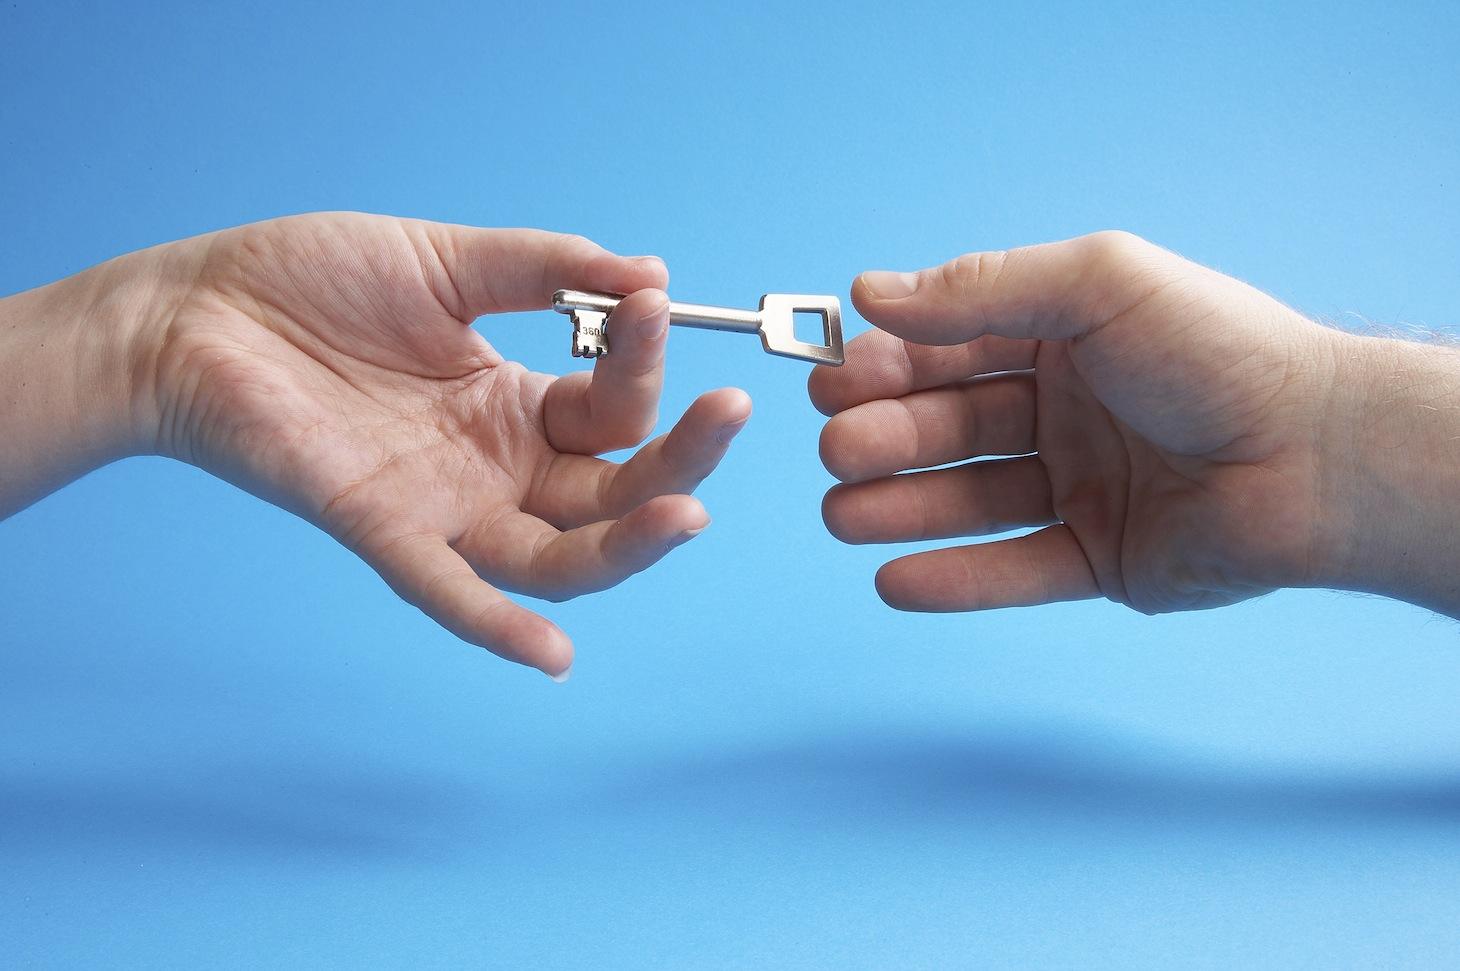 Home Exchange: Διαγωνισμός με δώρο 2 συνδρομές αξίας 130 η κάθε μία.